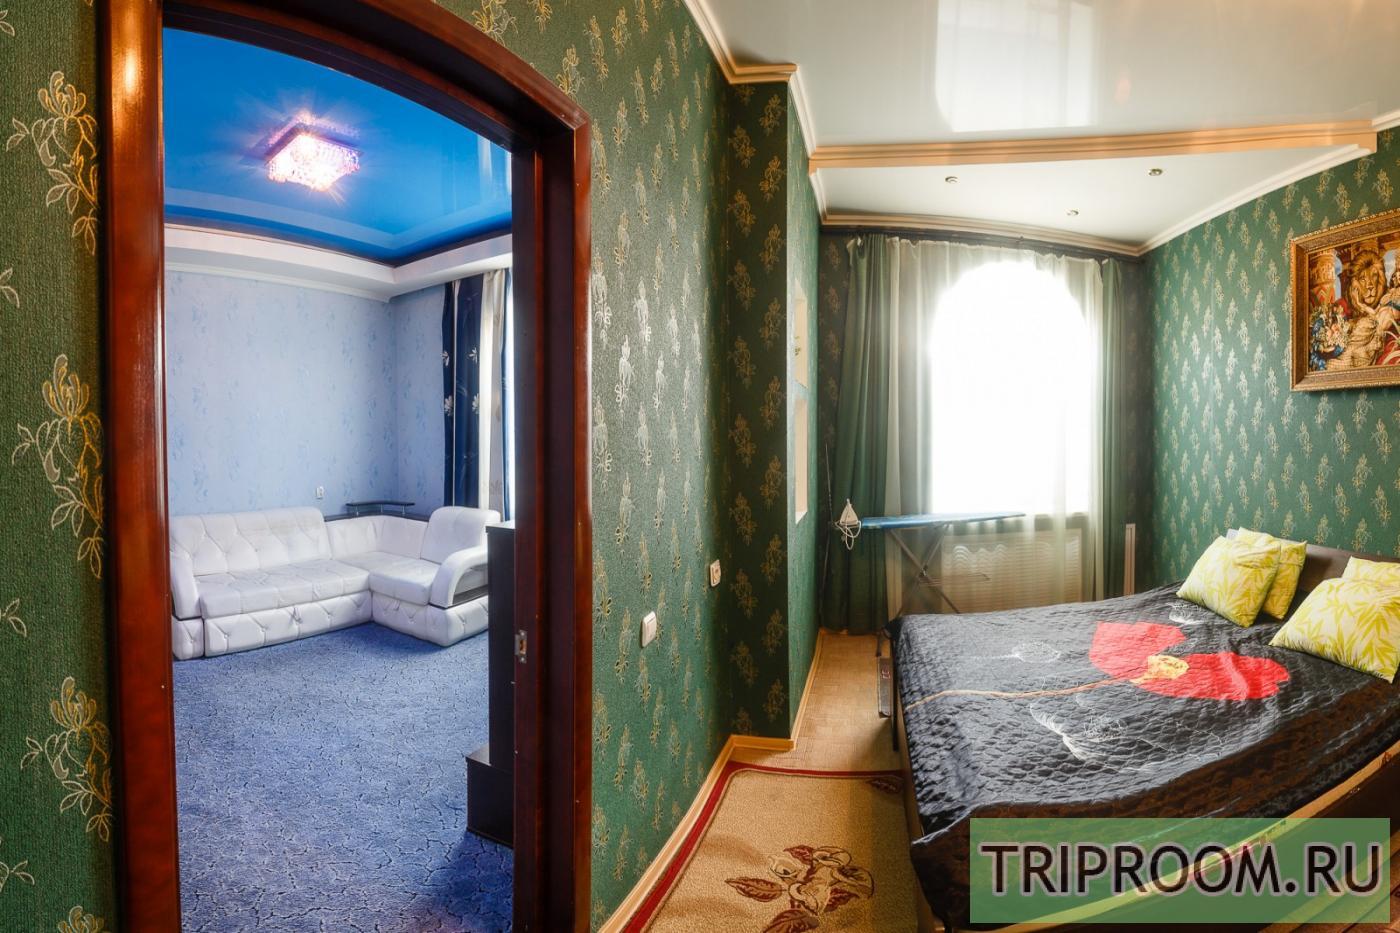 3-комнатная квартира посуточно (вариант № 15948), ул. Назарбаева улица, фото № 4